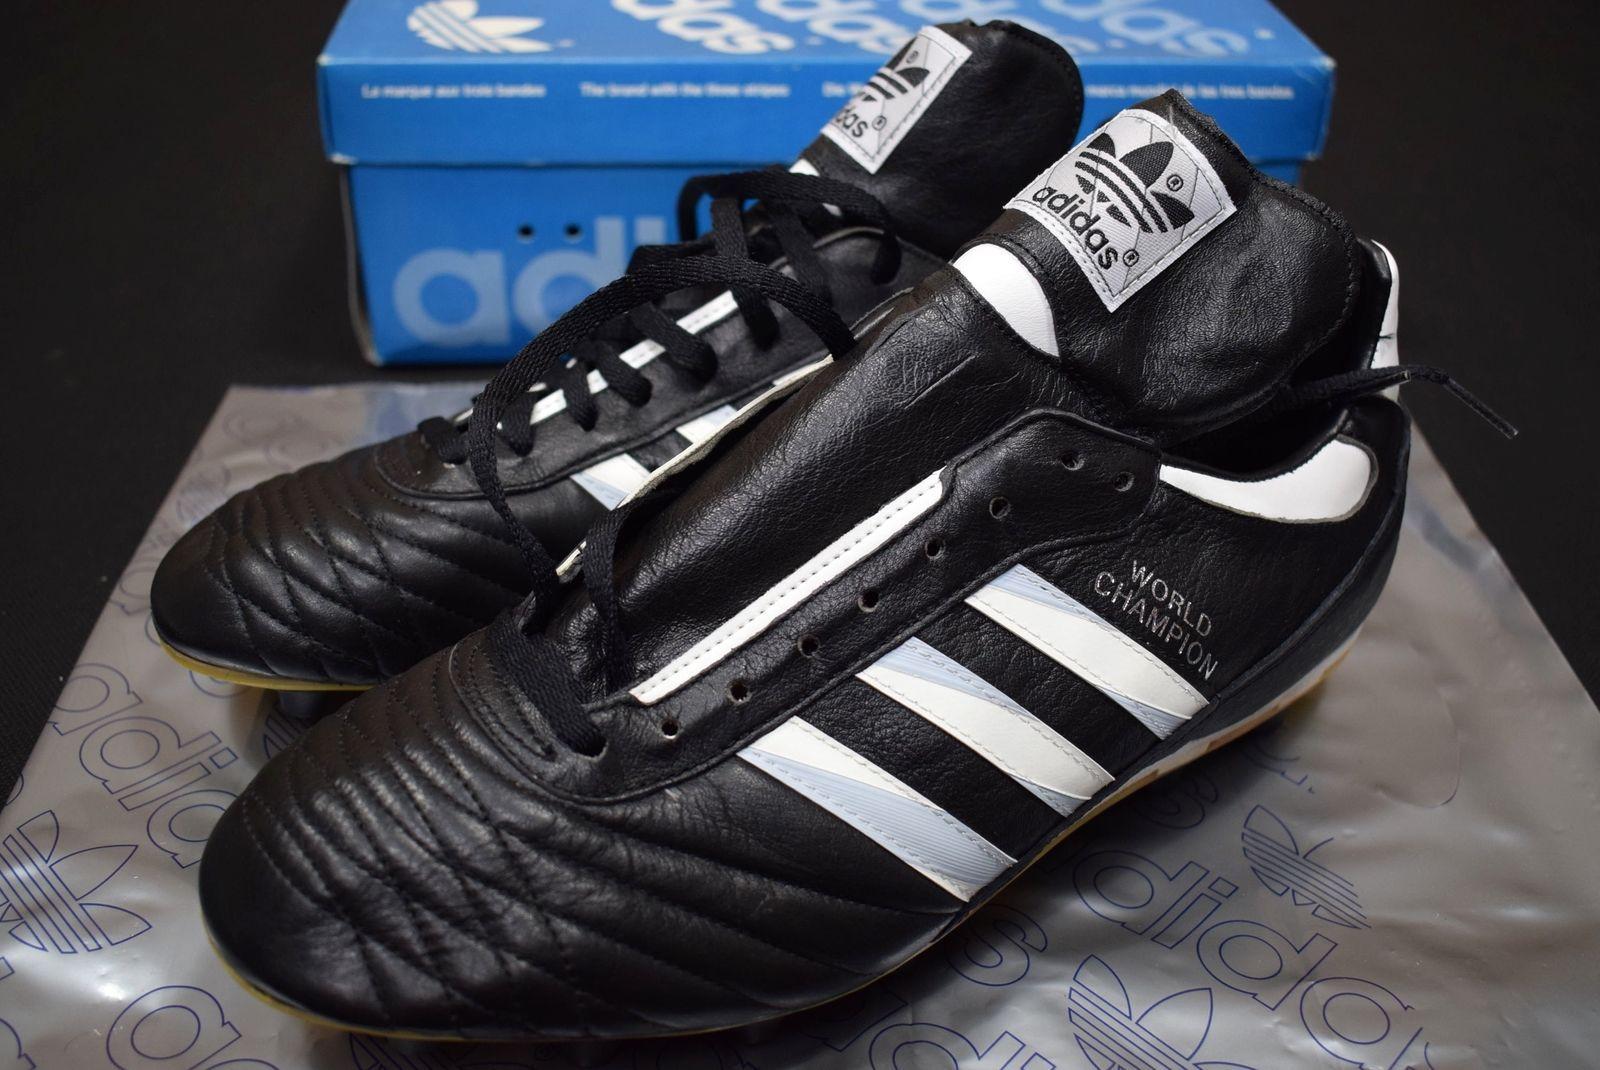 ec7a77342 Adidas World Cup Fussball Schuhe Soccer Shoes Football Cleats West Germany  44 NE | eBay